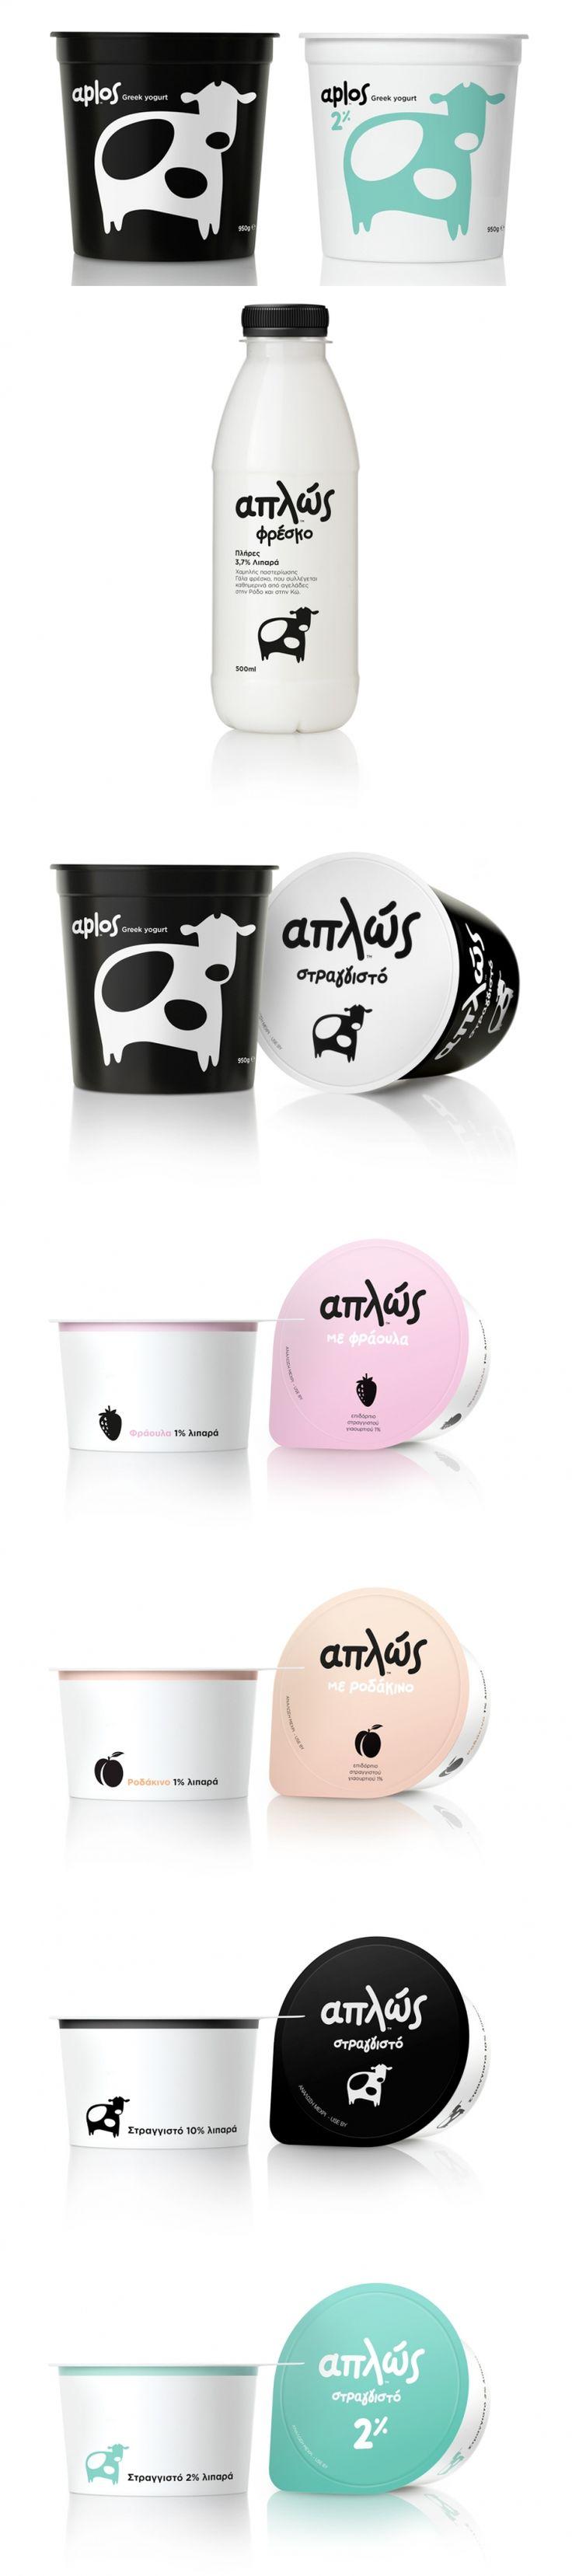 Aplos — The Dieline | Packaging & Branding Design & Innovation News